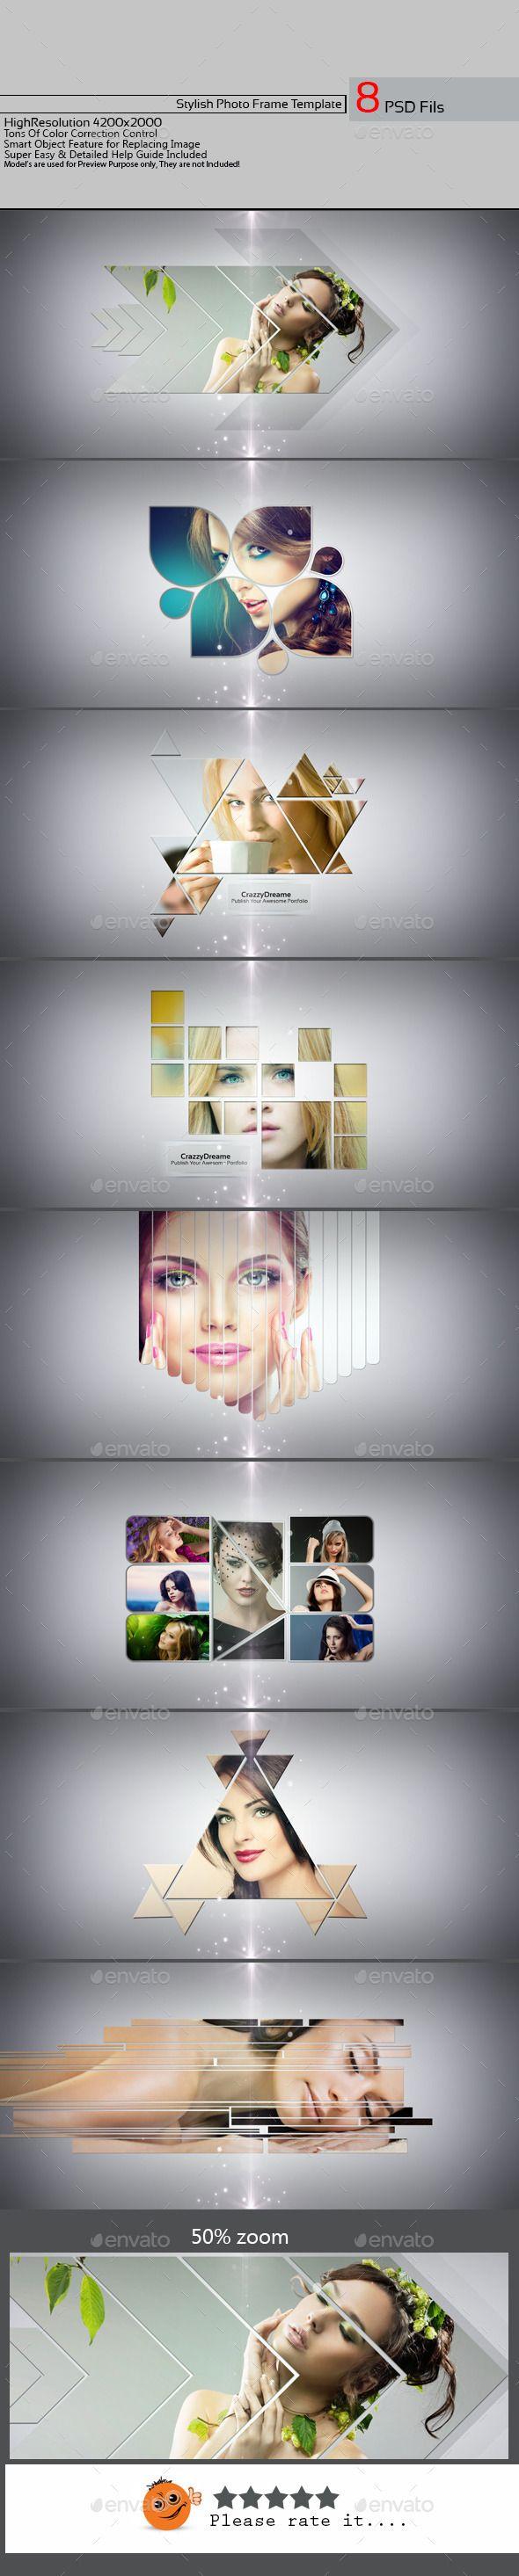 Stylish Photo Frame Template PSD Download: http://graphicriver.net/item/stylish-photo-frame-template-v01/11470560?ref=ksioks